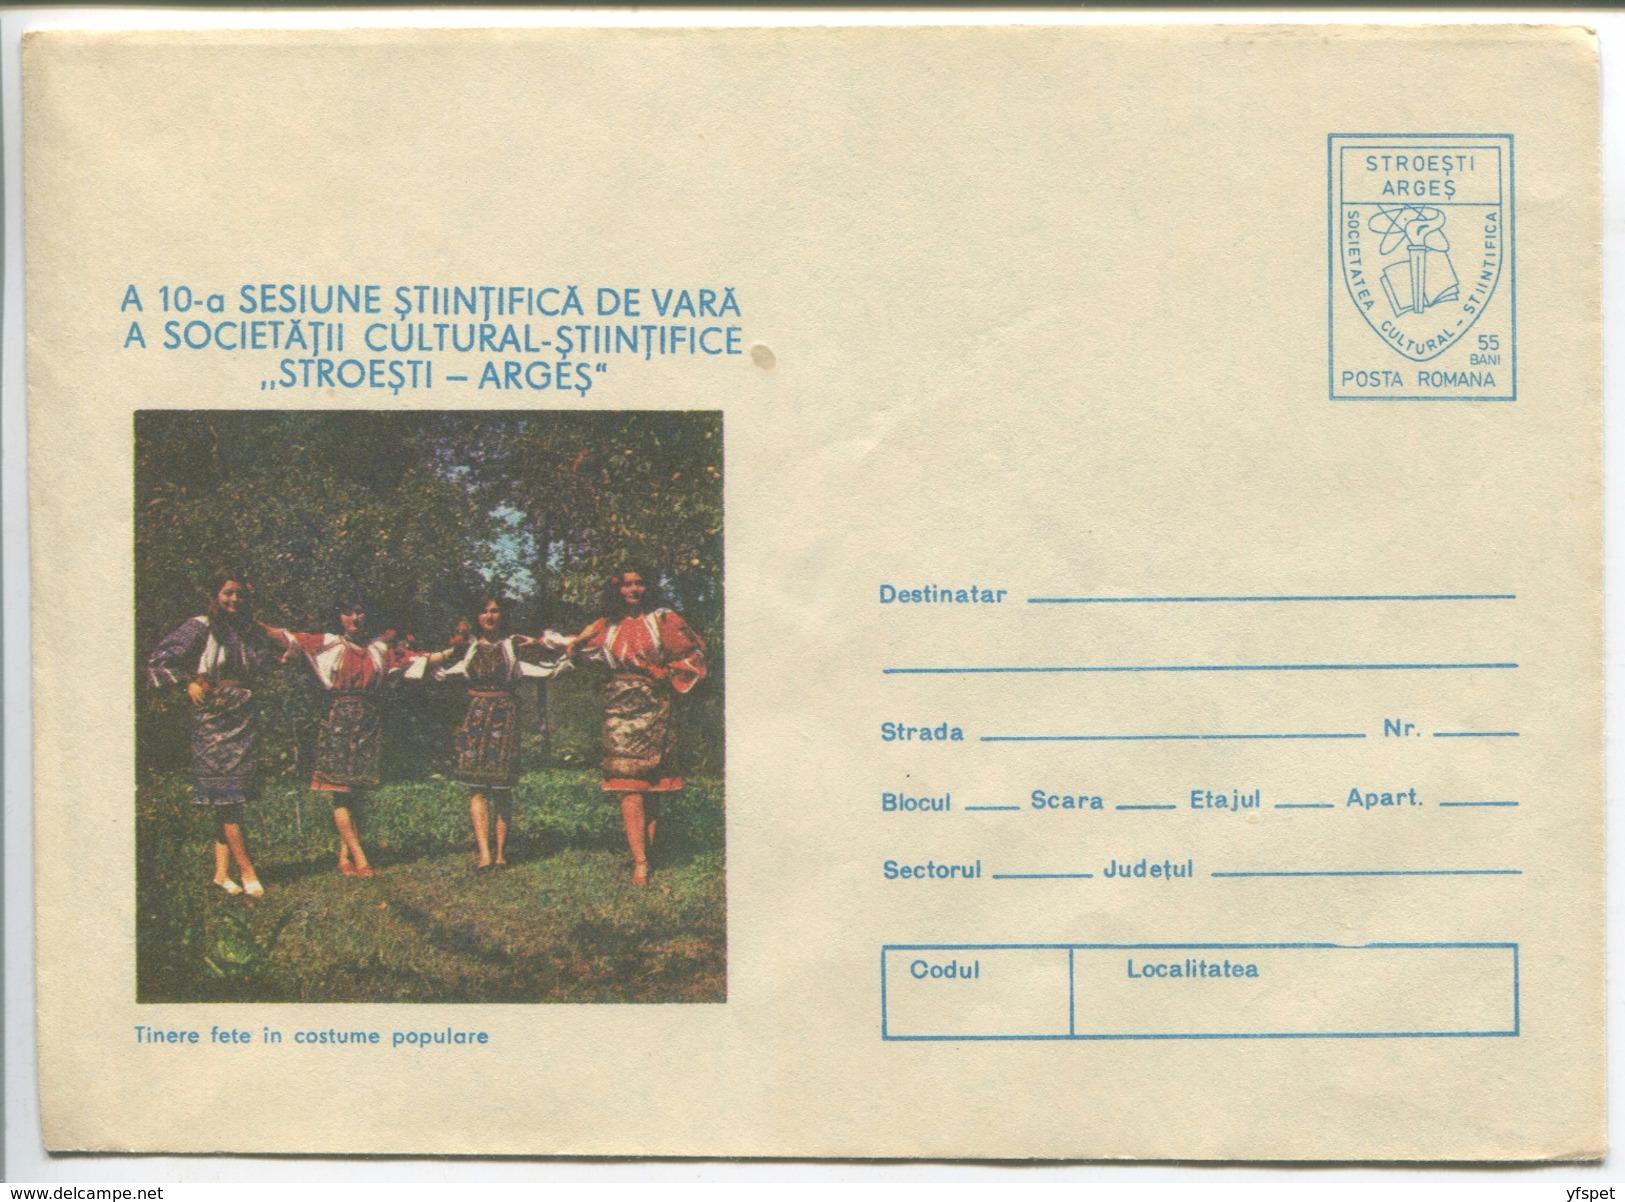 Stroesti-Arges Commune - Women In Local Costumes - Stationery (stamp: Original Design) - Costumes